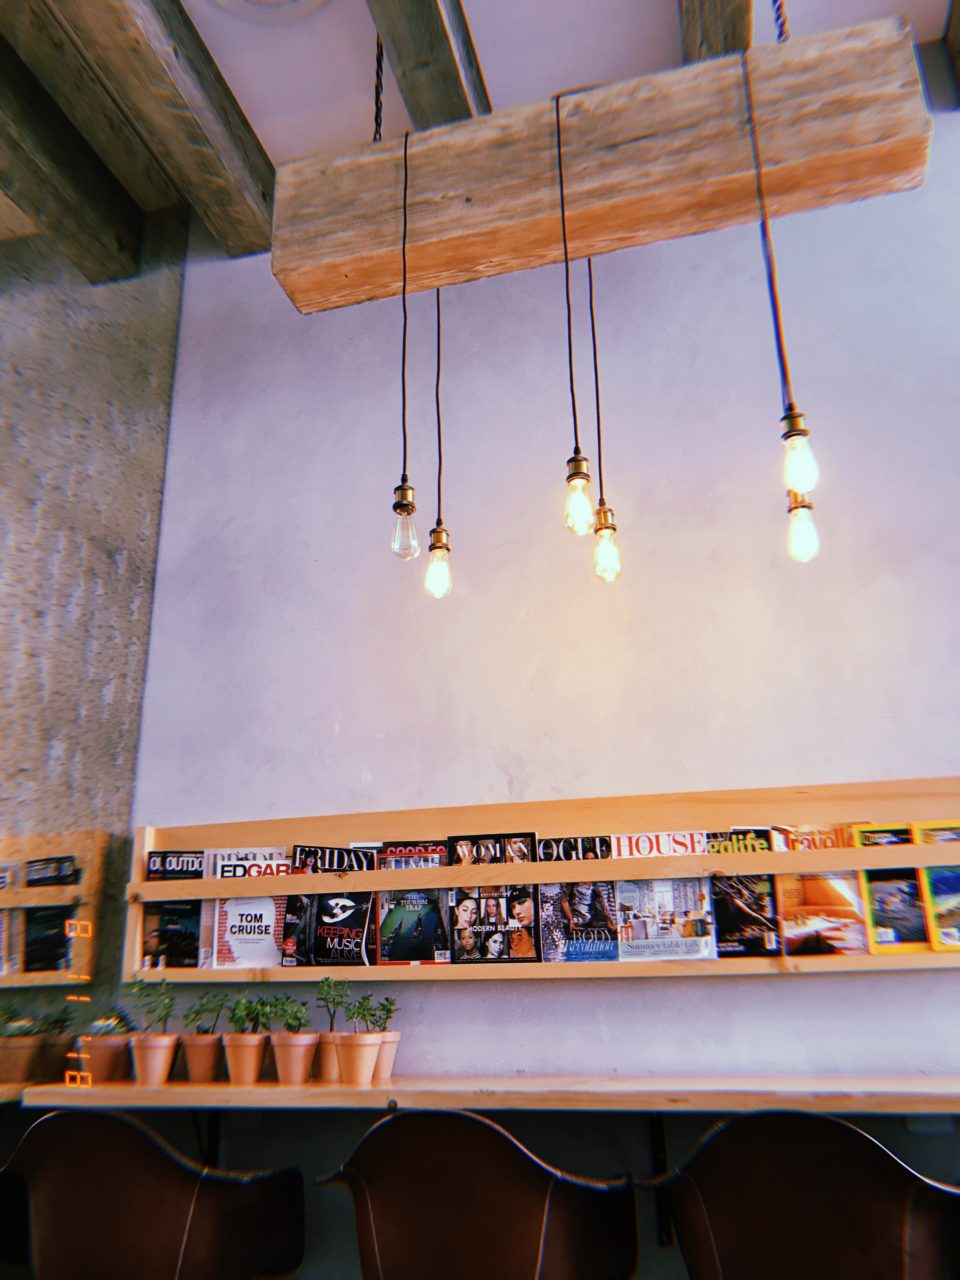 lifestyle redesign  - 2018 08 11 102936.109 960x1280 - Lifestyle Sunday: Review of IZU Bakery in Dubai